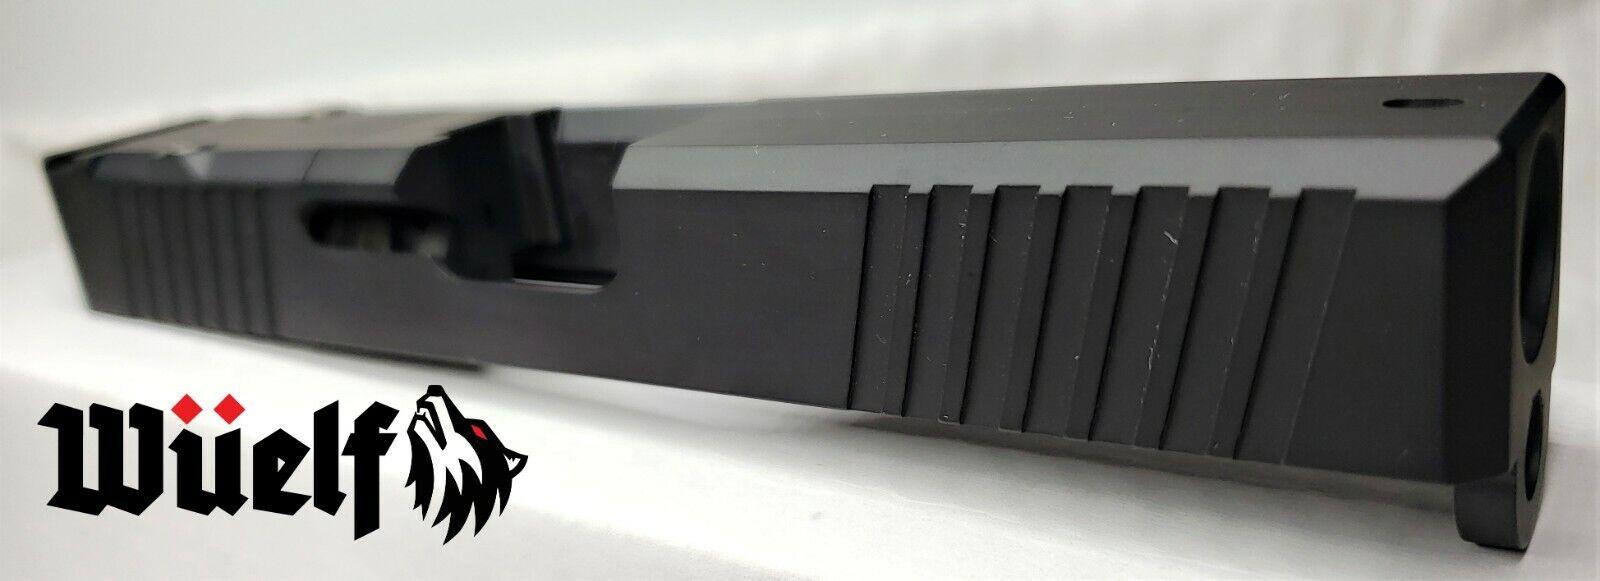 Glock 17 Slide Chamfer Edge w//RMR and Cover by Wüelf in Black Cerakote